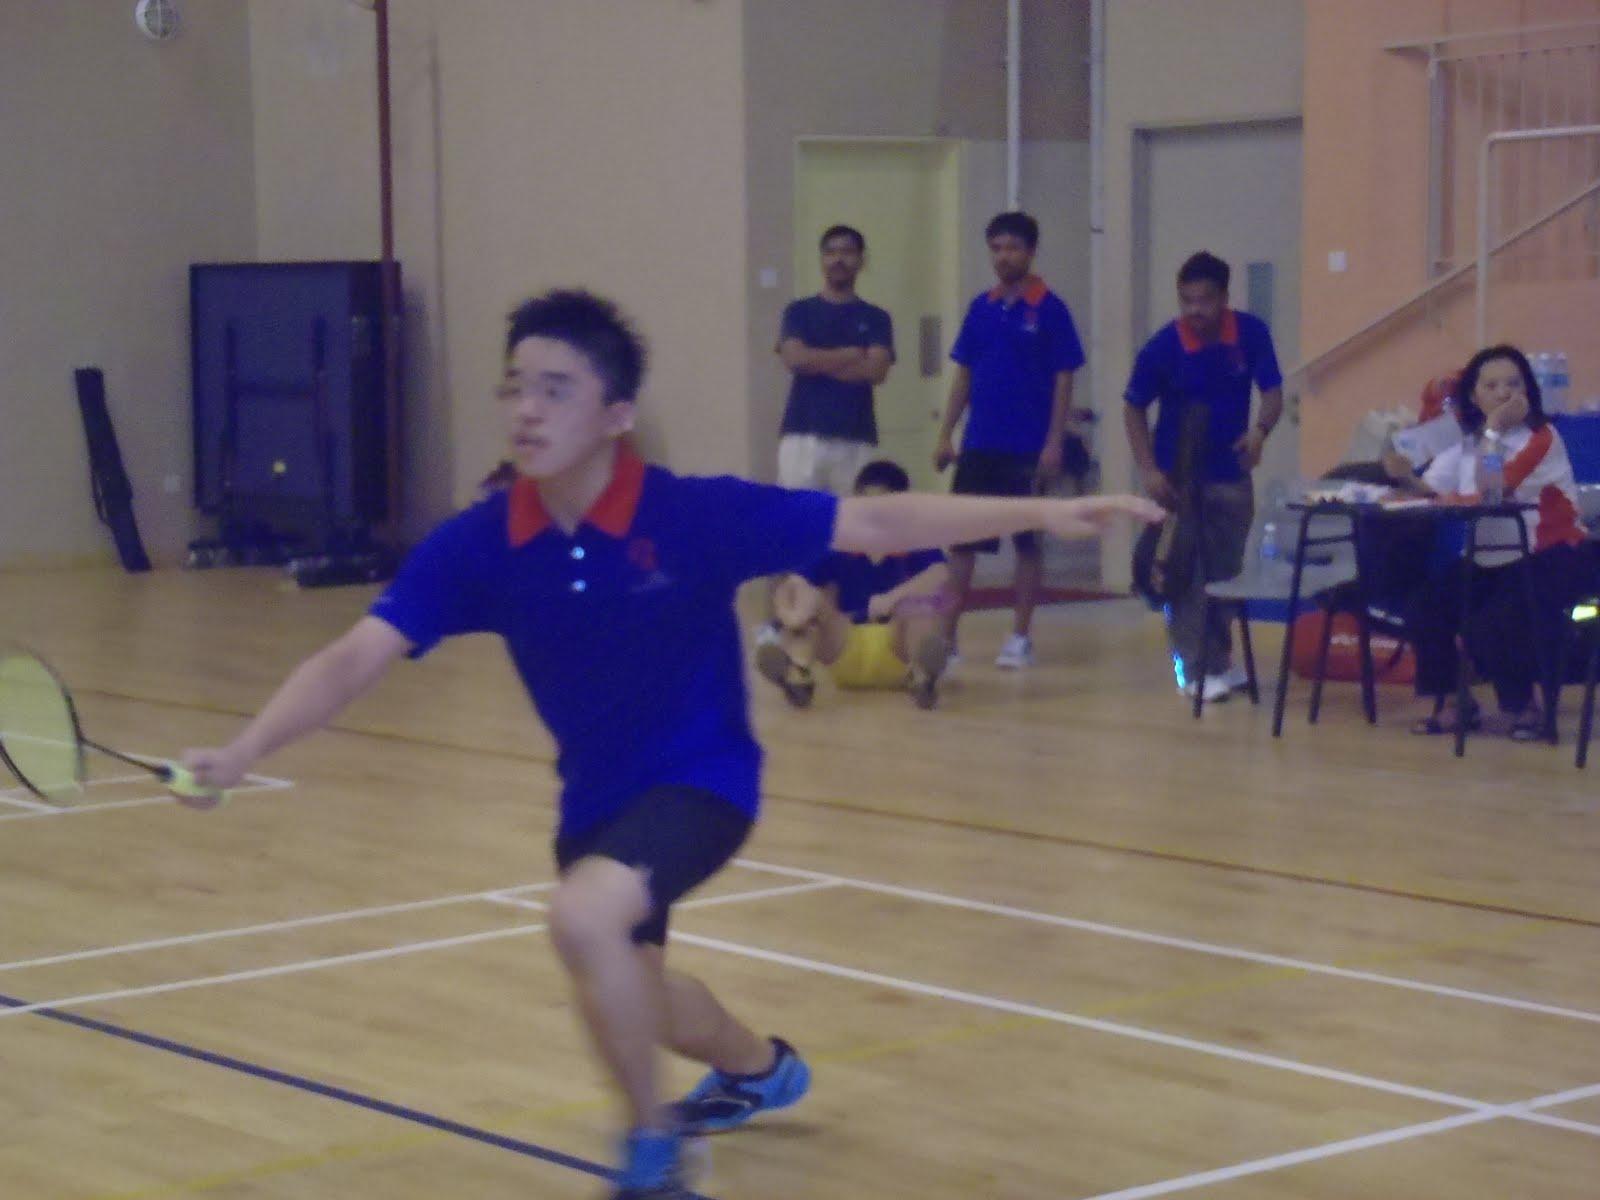 Bukit Batok East - Build. Bond. Engage.: Community Games ... Badmintonbond